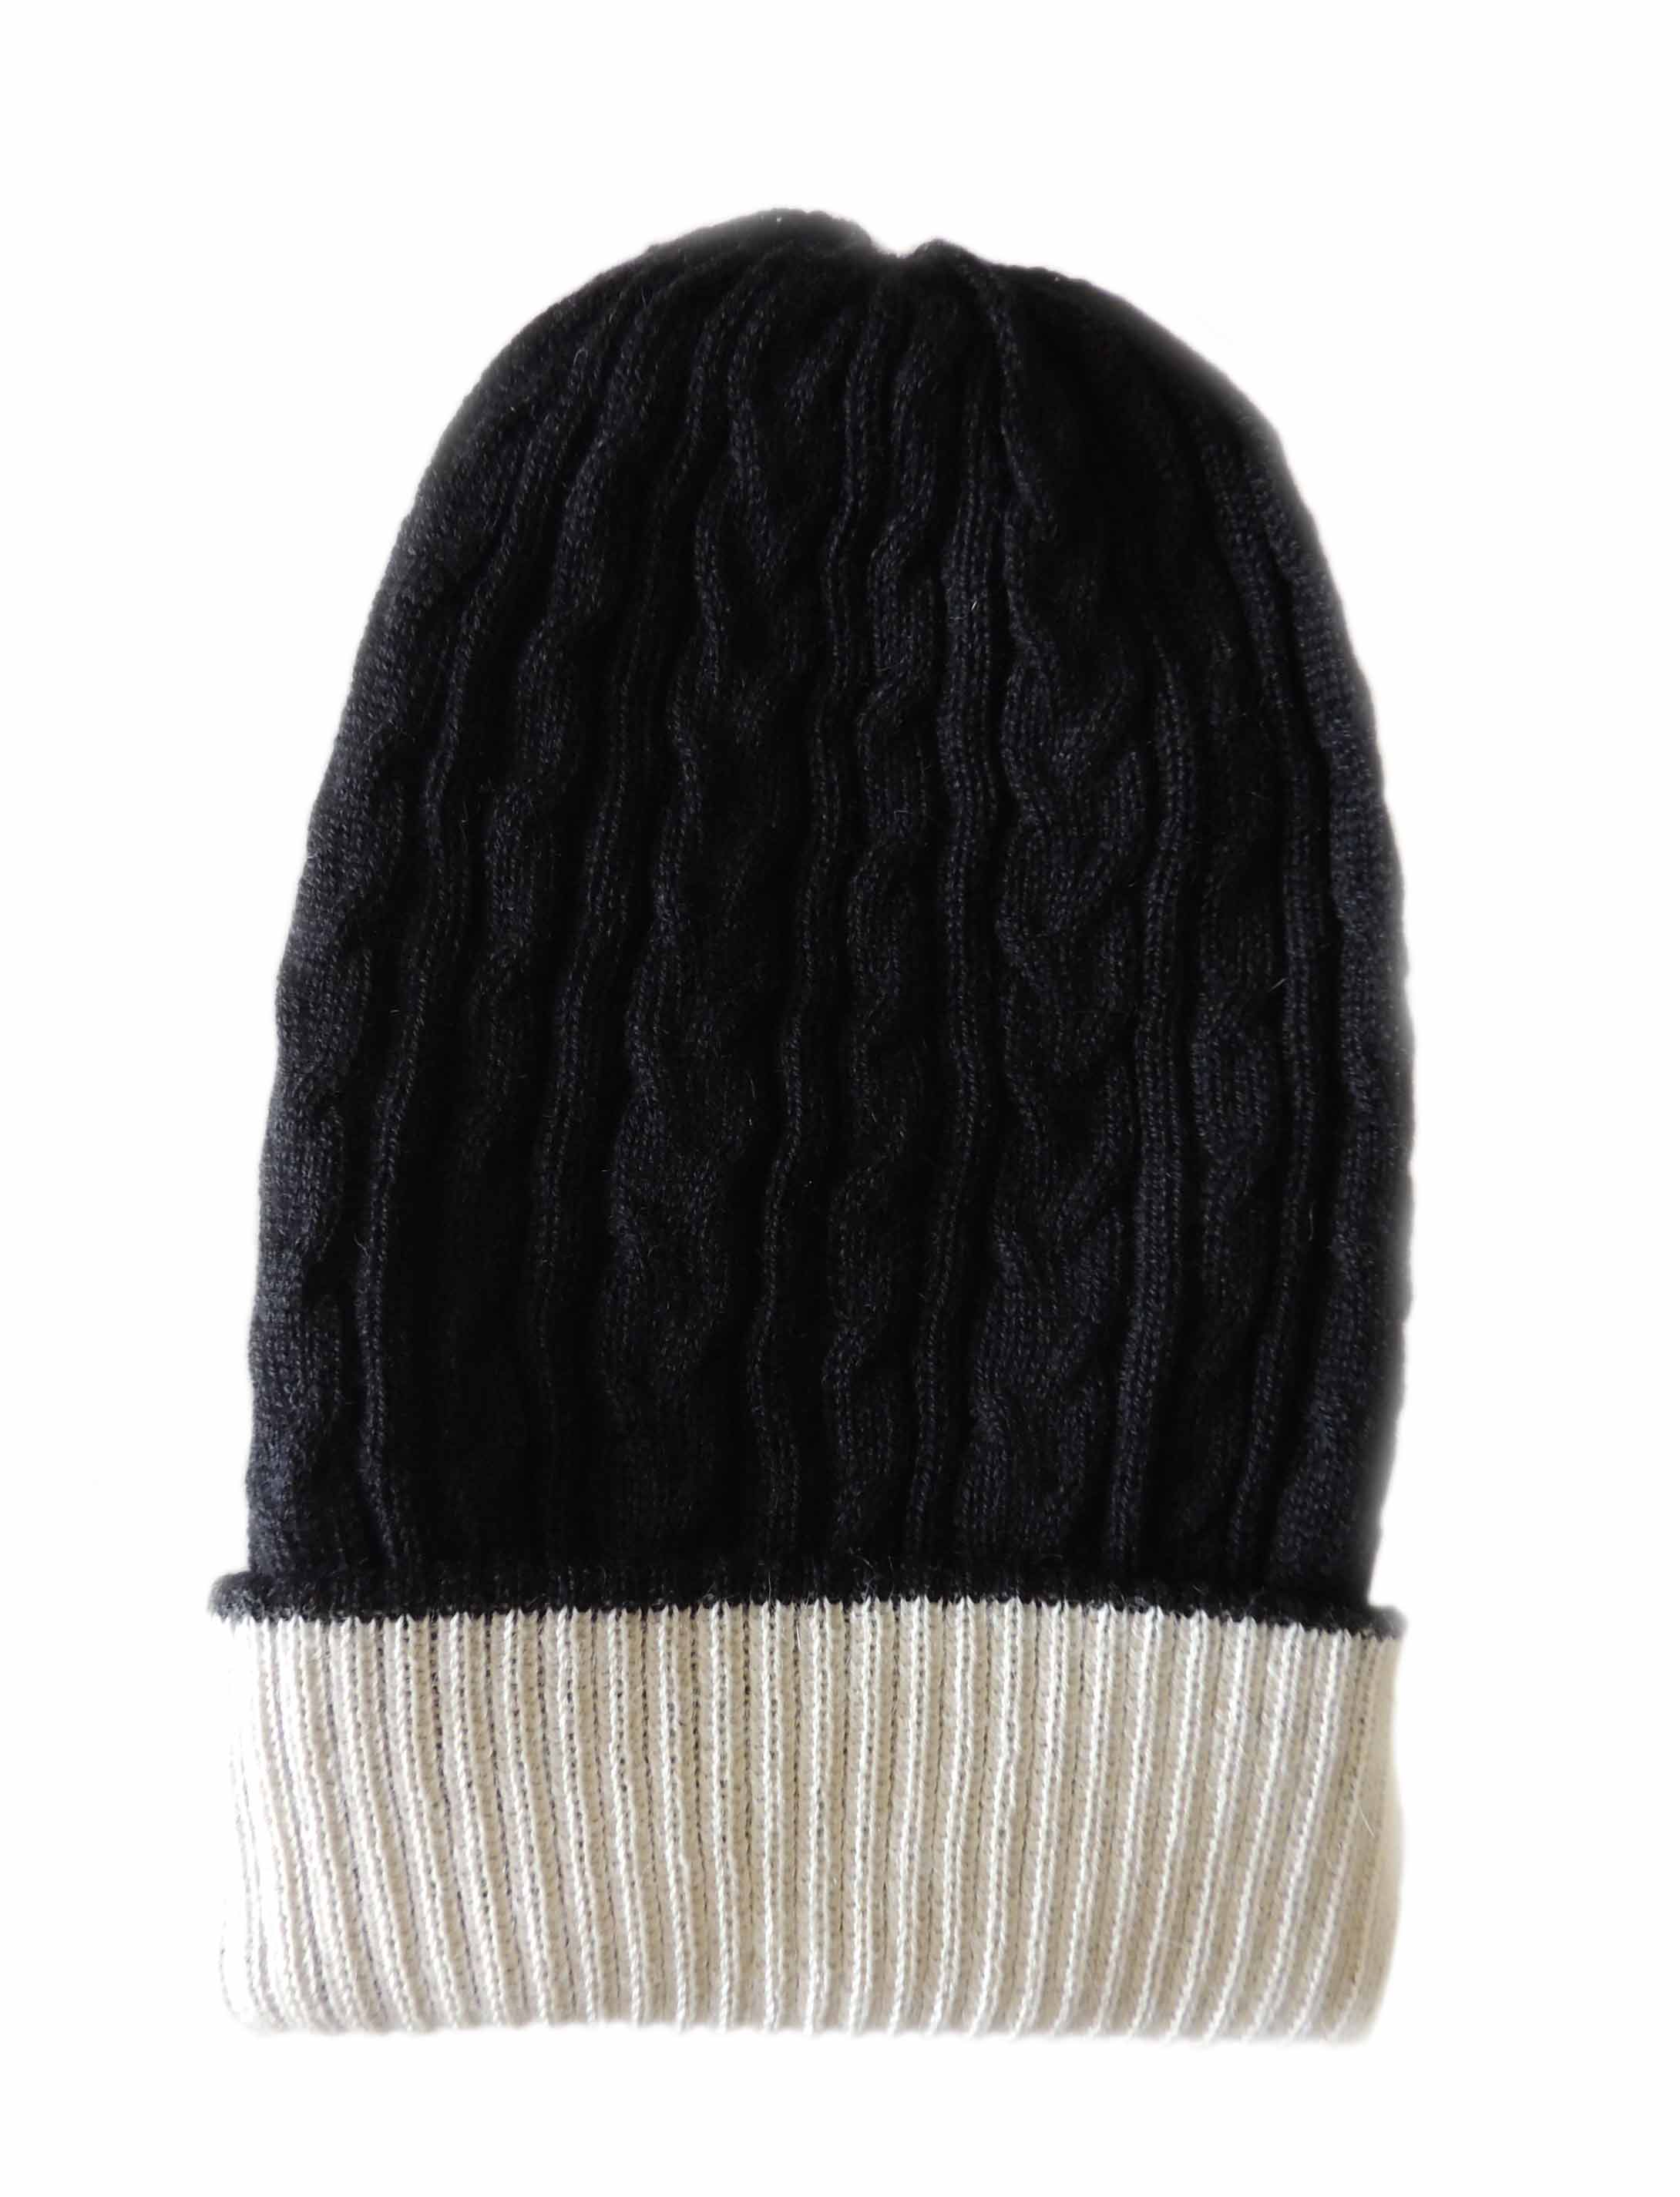 PFL knitwear Muts omkeerbaar creme  zwart